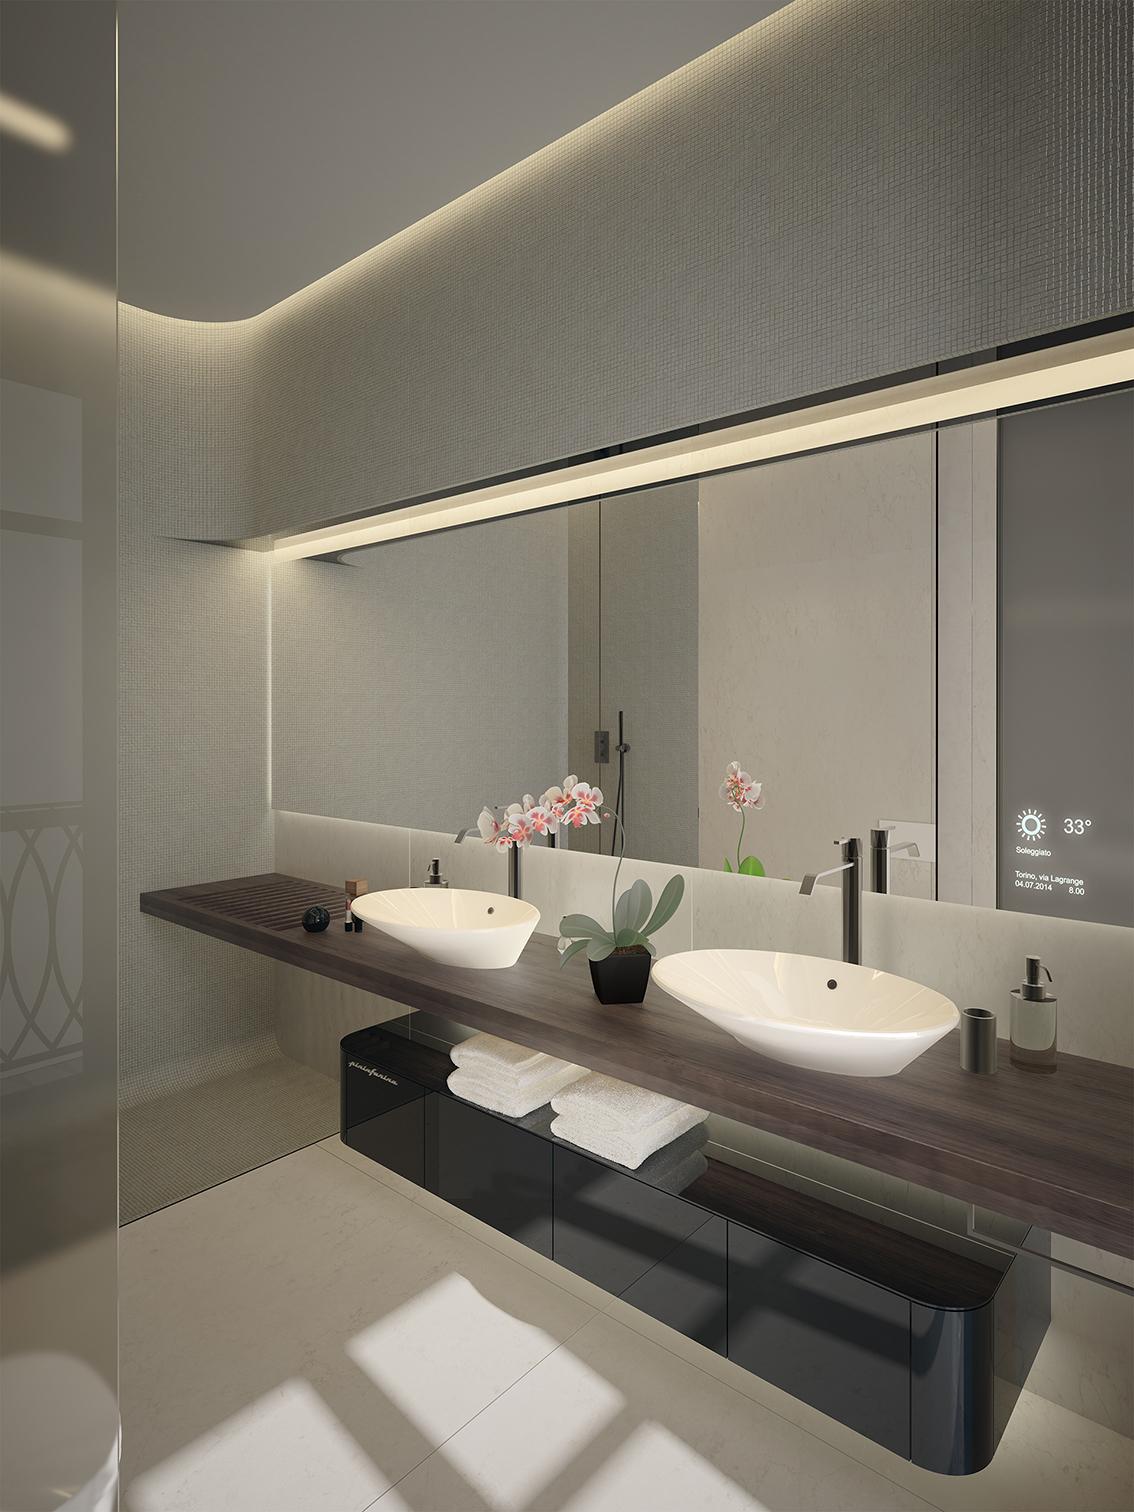 Interiors by Pininfarina